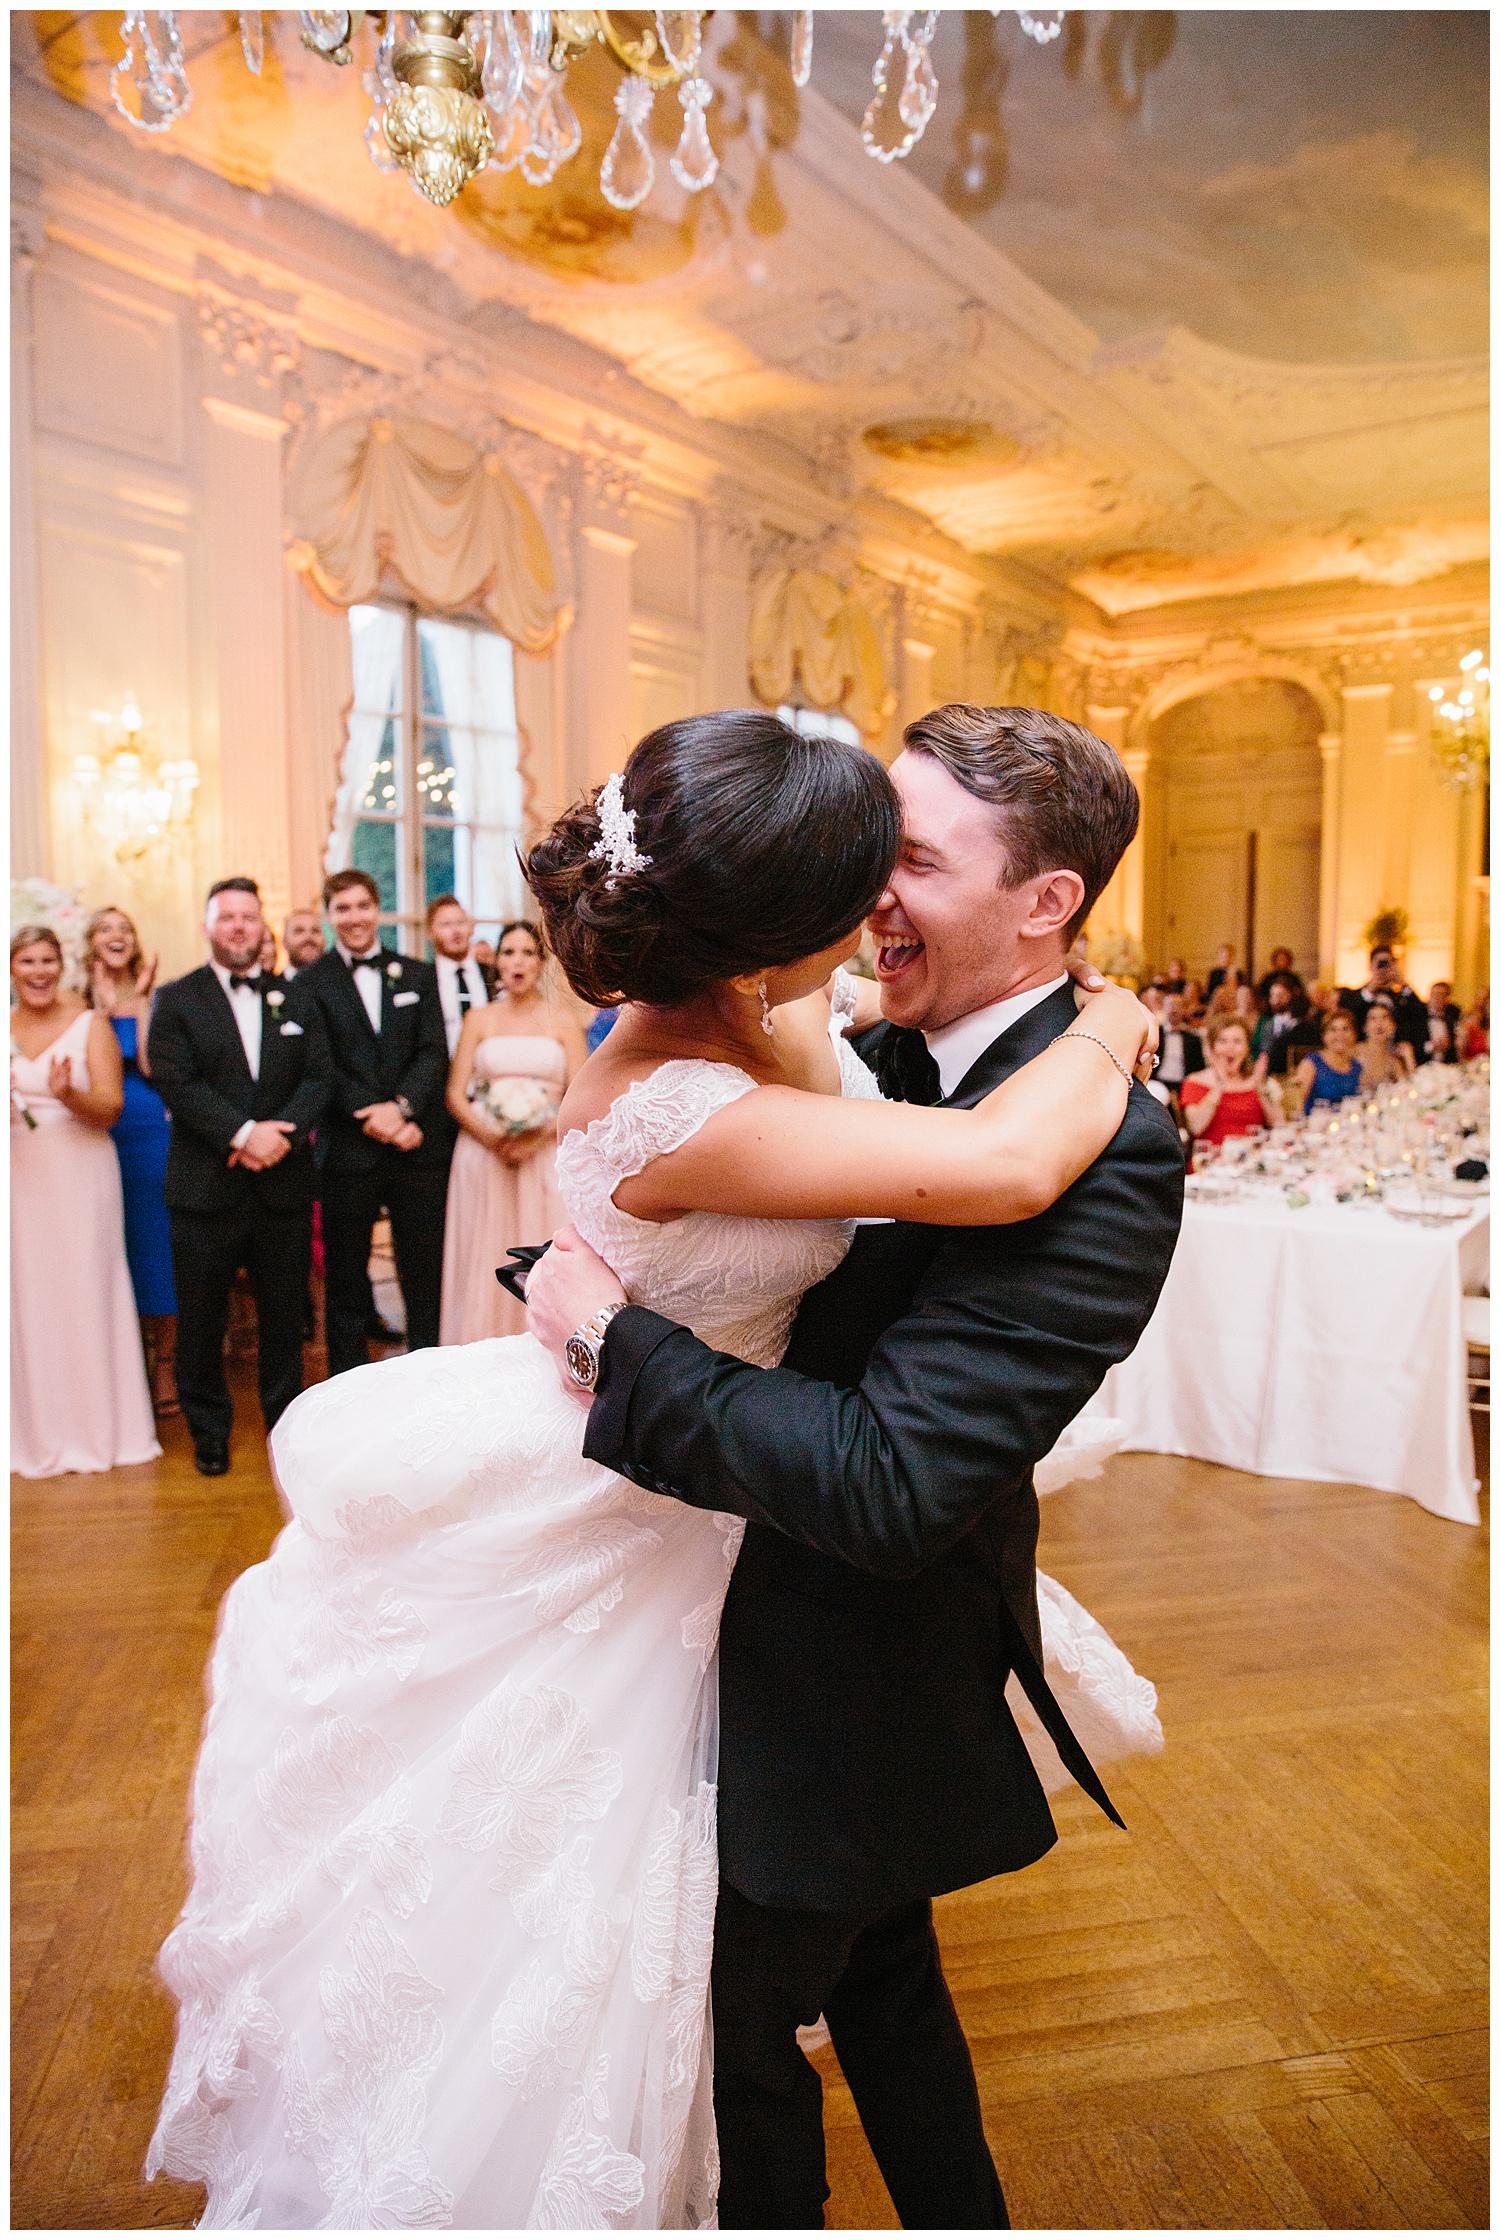 Stephen_Nathalie_Rosecliff_Mansion_Wedding_027.jpeg